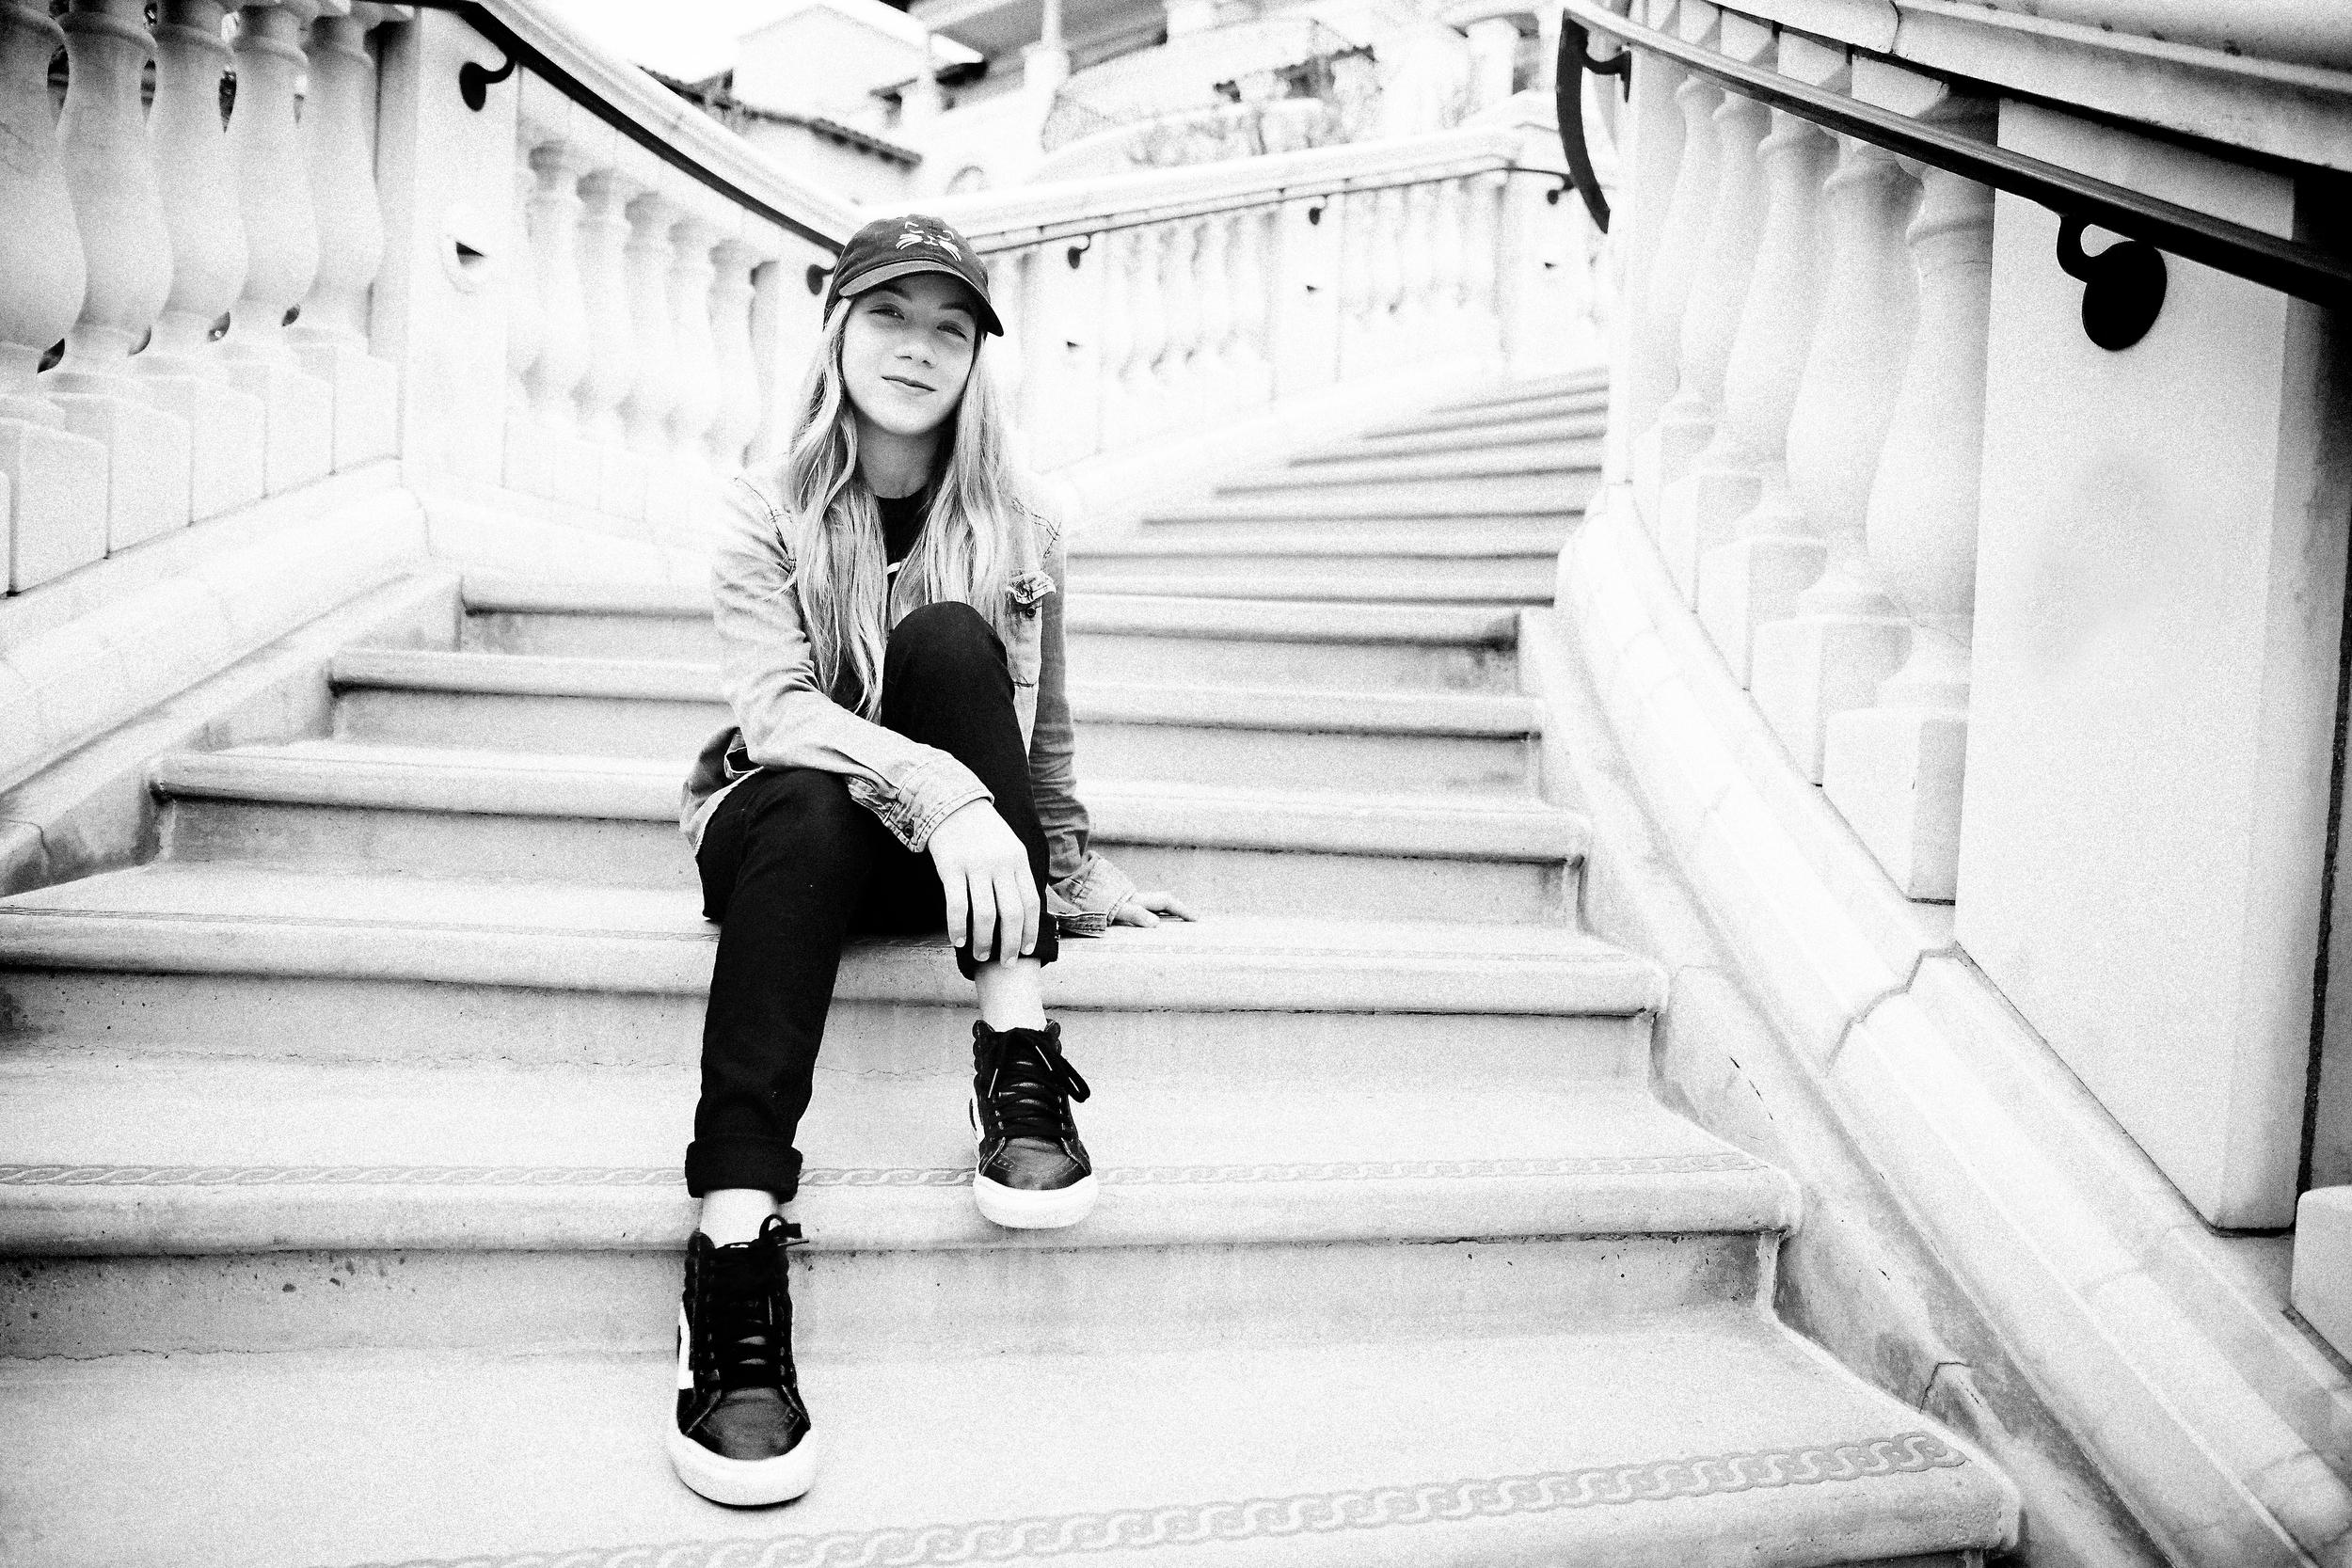 Brighton Zeuner Professional Skateboarder